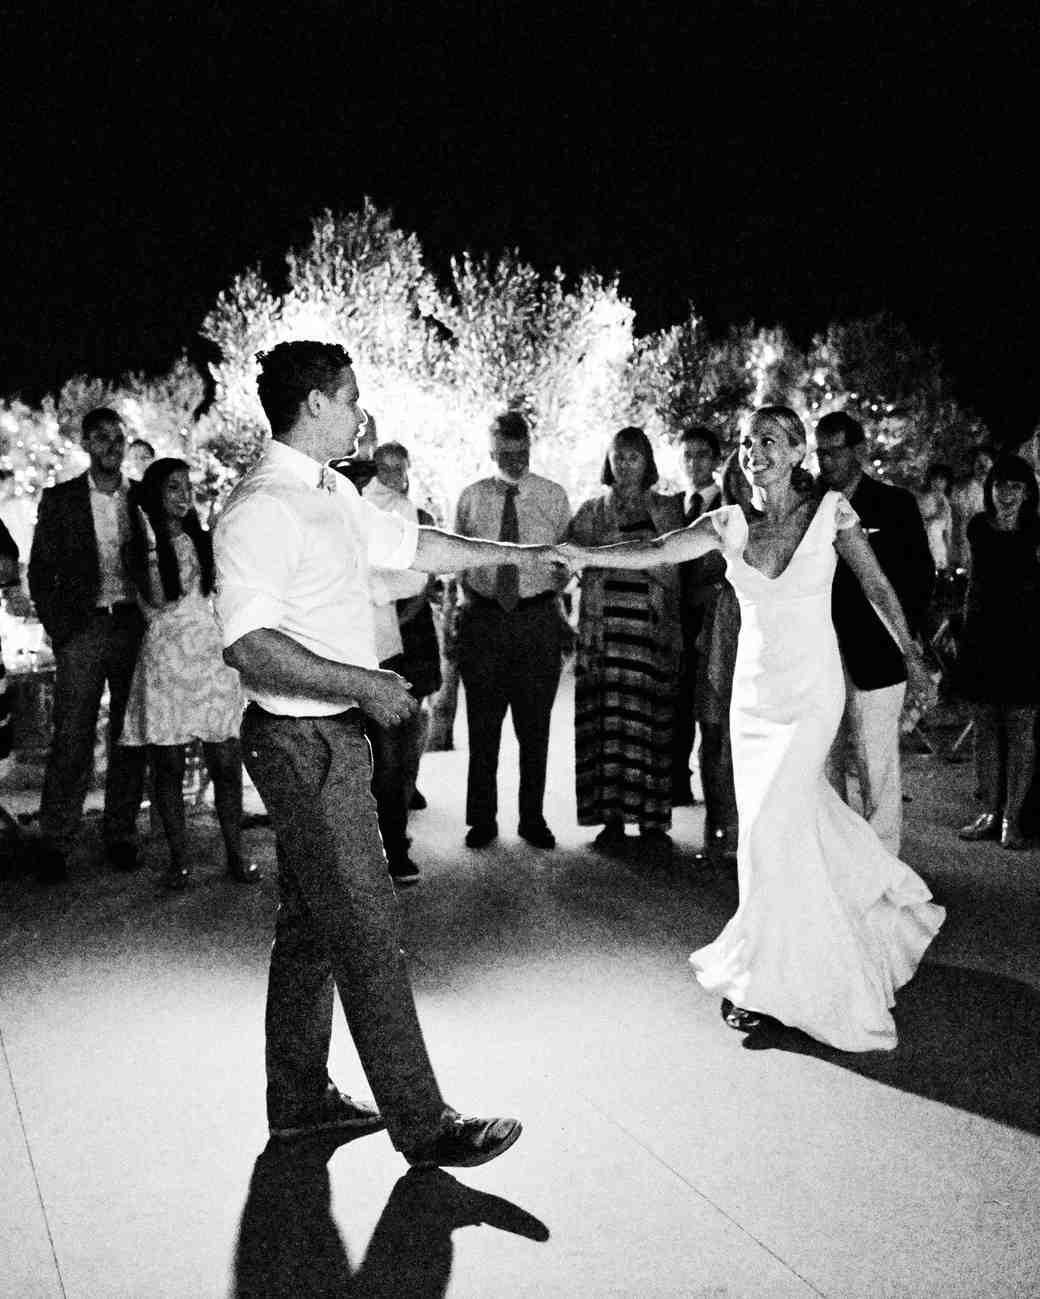 ana-alden-wedding-greece-611a6139-s111821.jpg